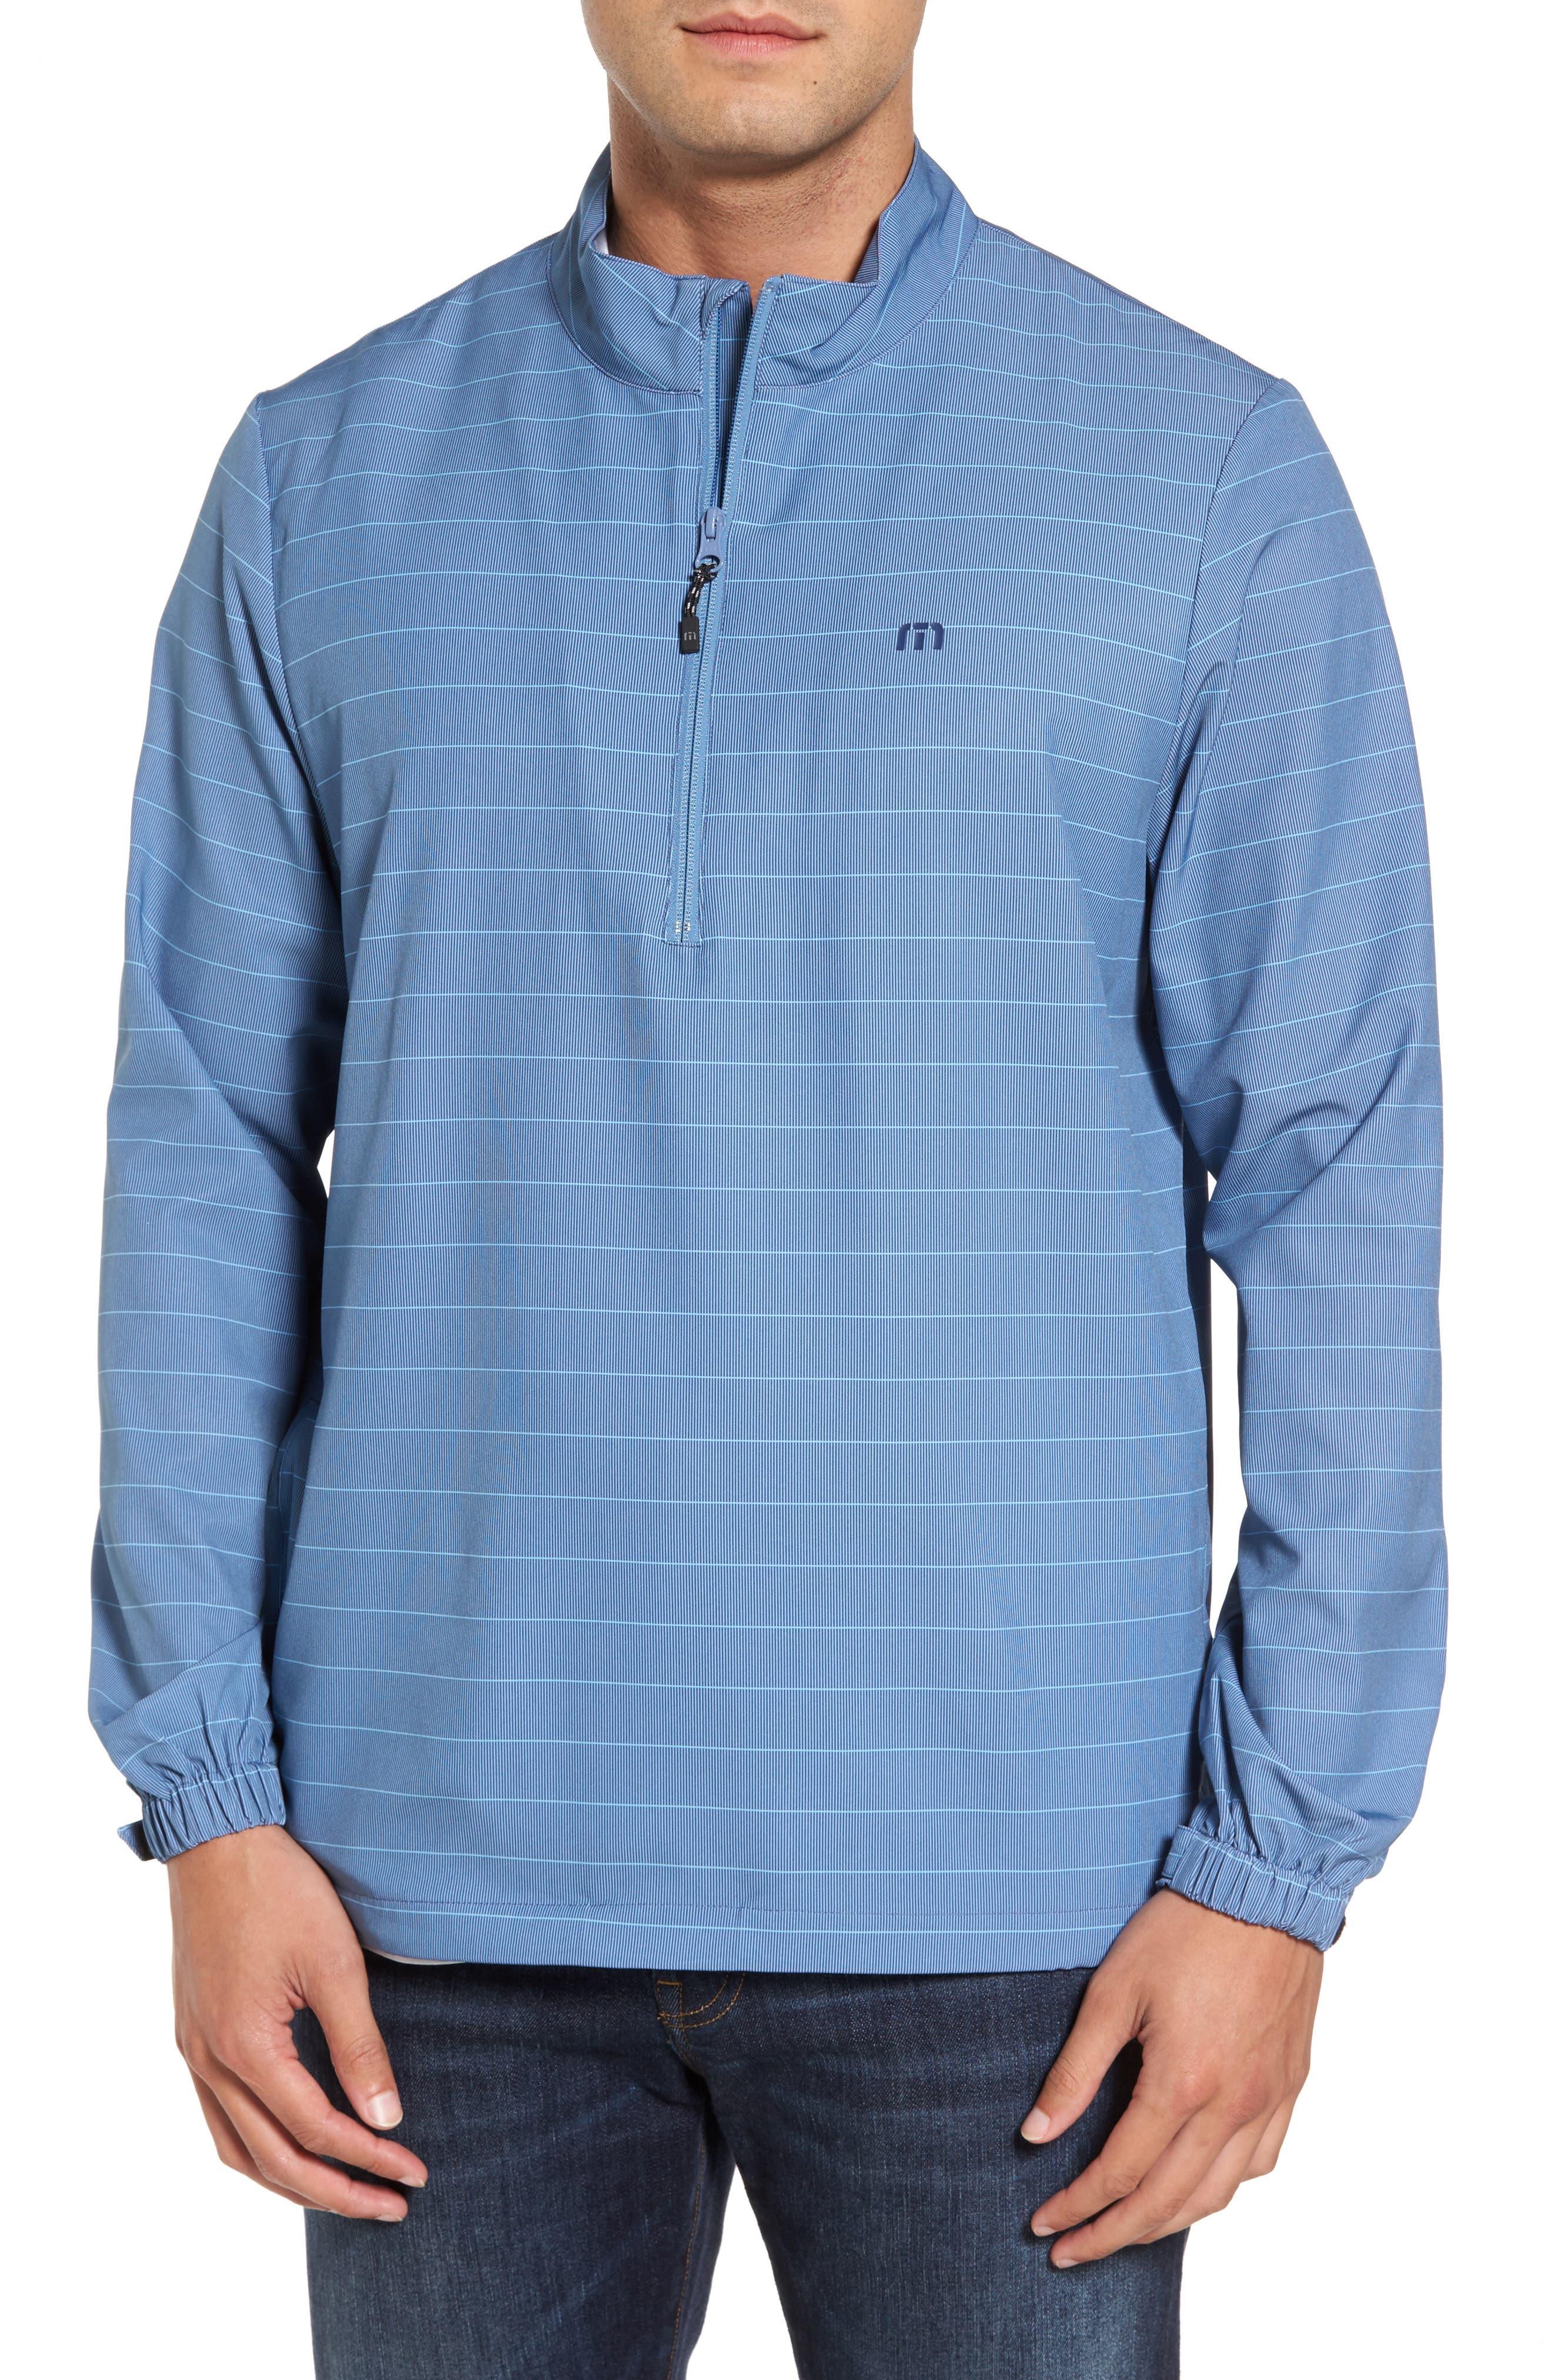 Dubes Quarter Zip Pullover Jacket,                             Main thumbnail 1, color,                             Blue Indigo